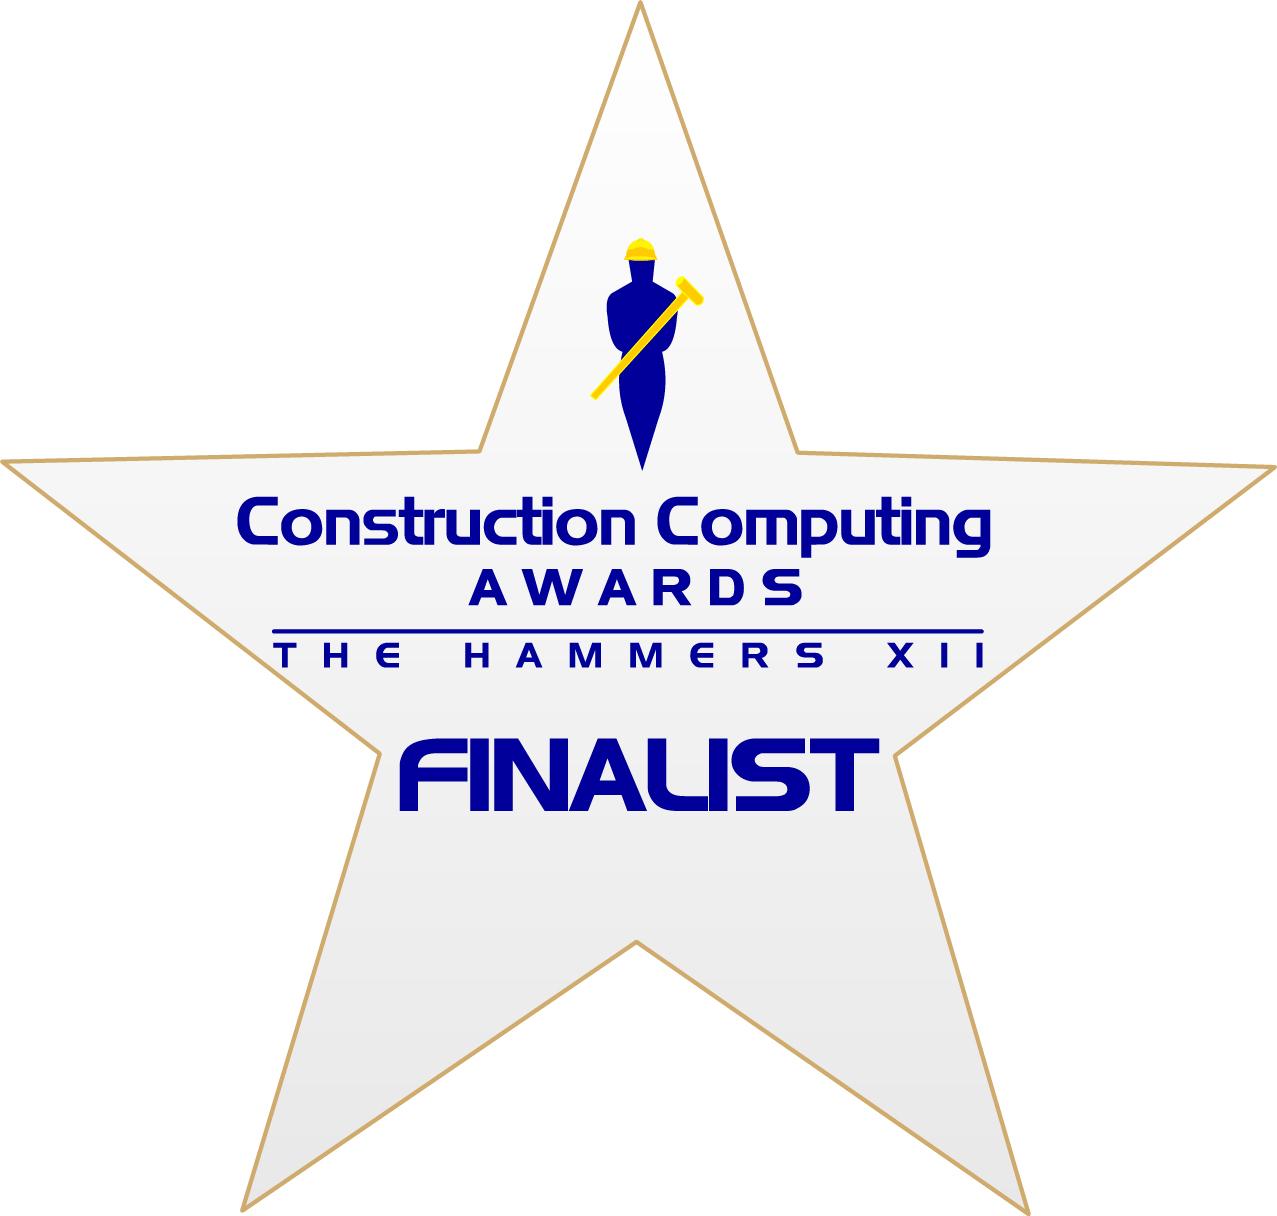 Construction Computing Awards